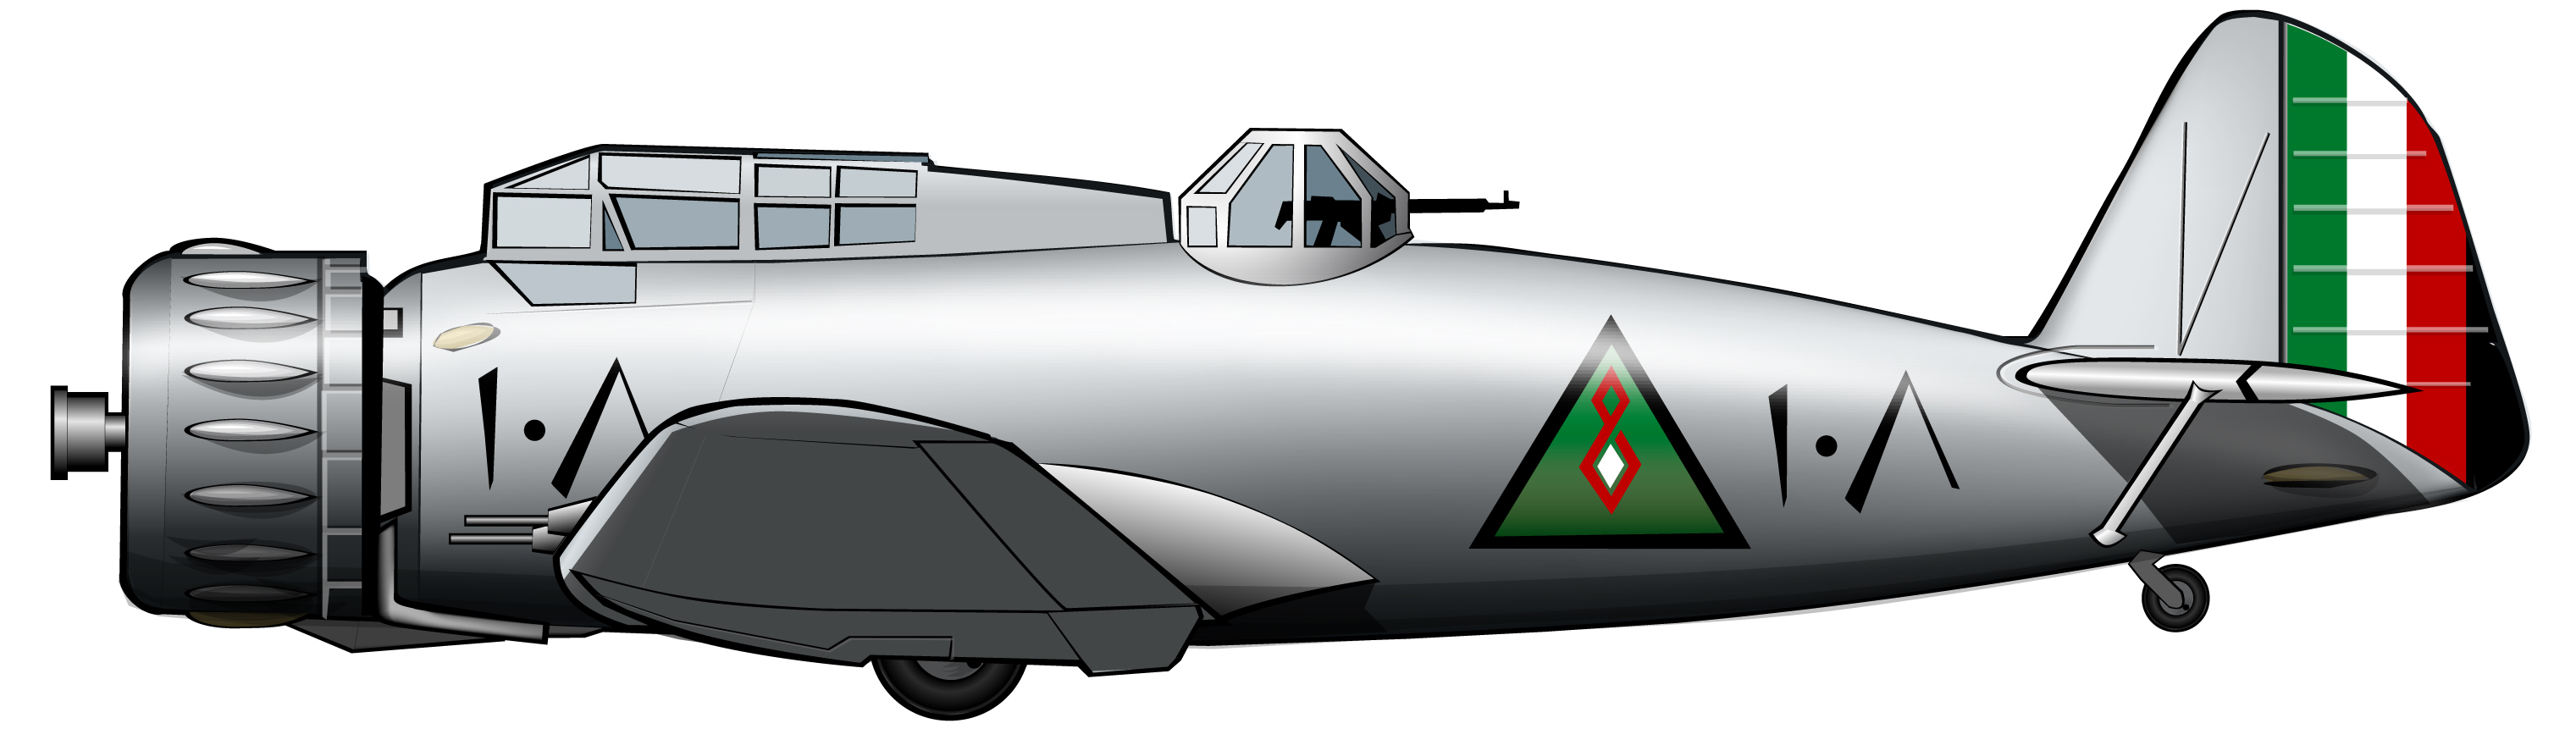 Breda65iraq1940